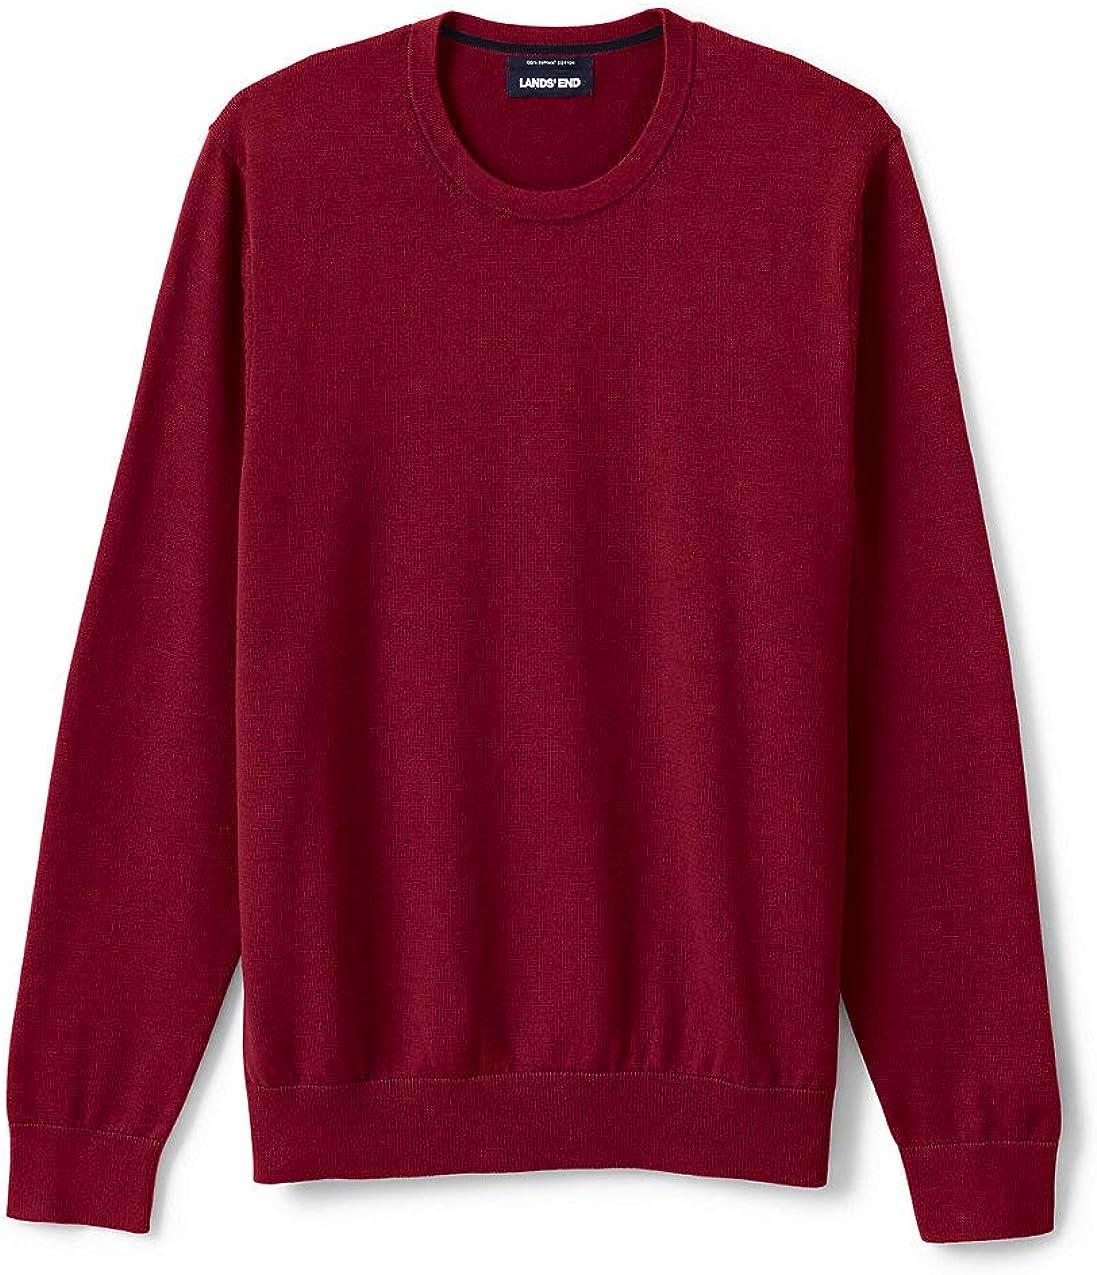 Lands End Mens Fine Gauge Supima Cotton Crewneck Sweater